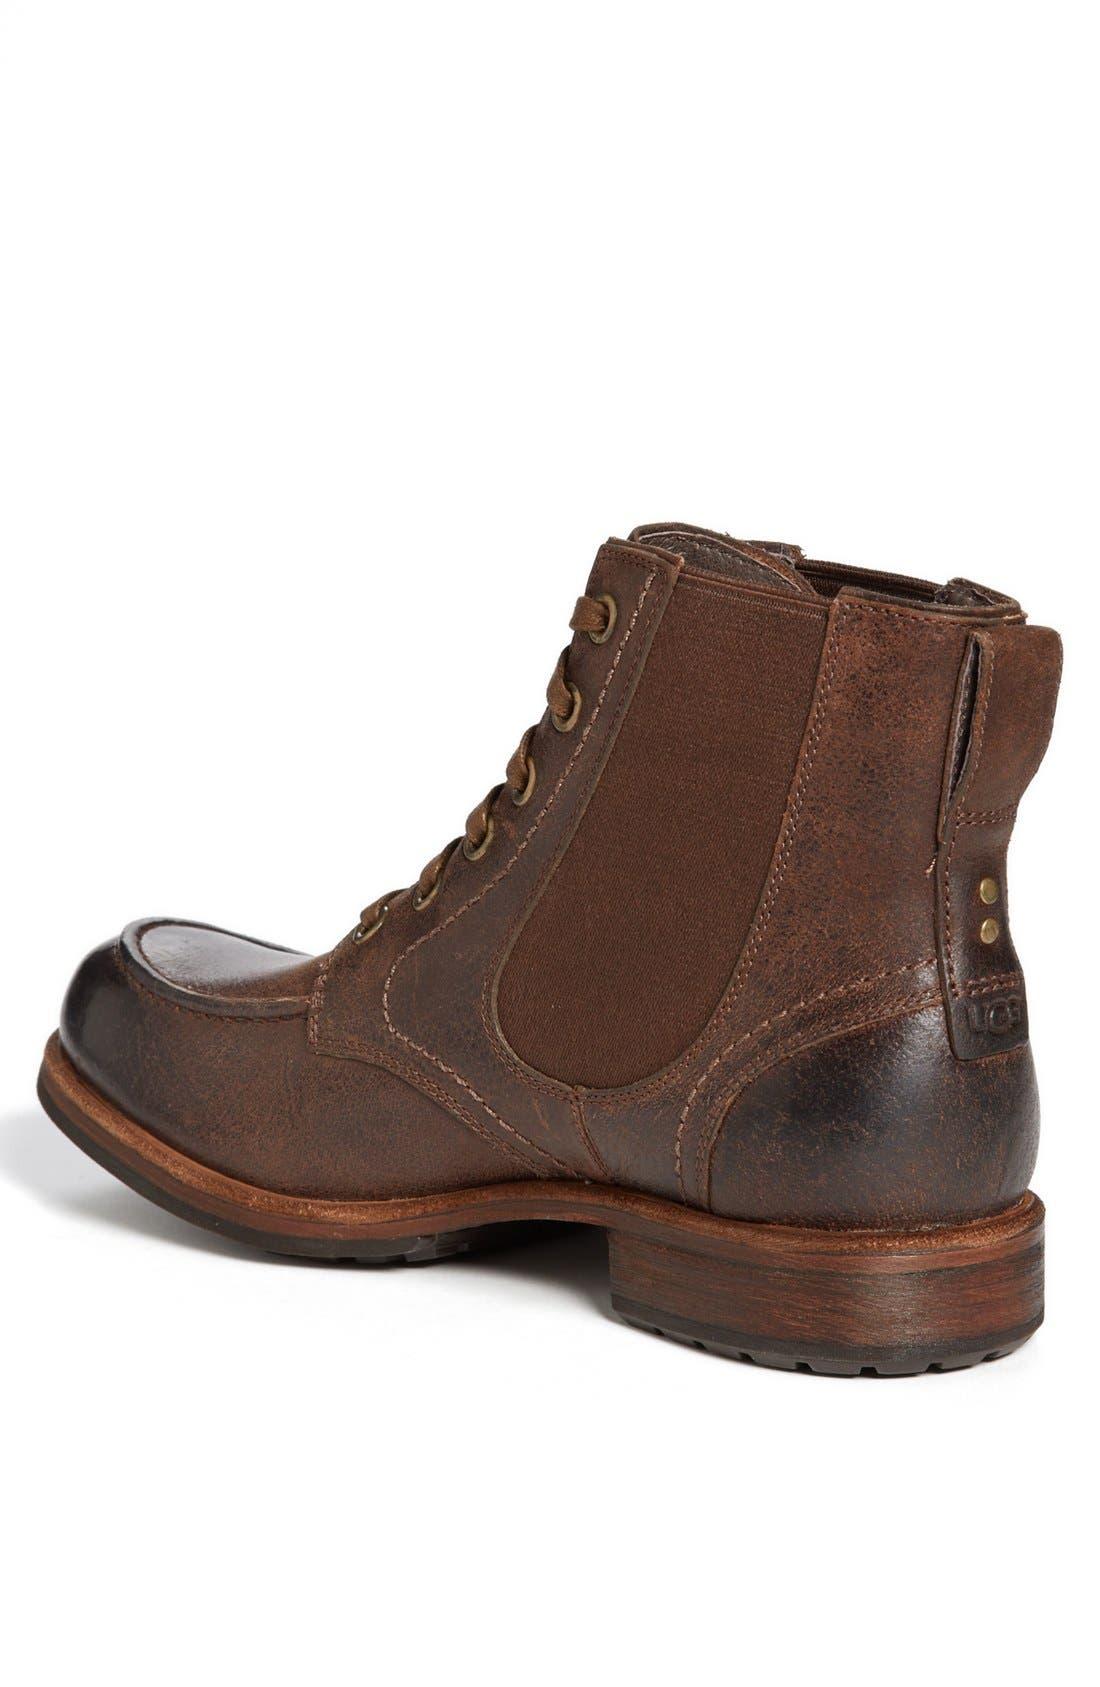 Alternate Image 2  - UGG® Australia 'Jarrett' Moc Toe Boot (Men)